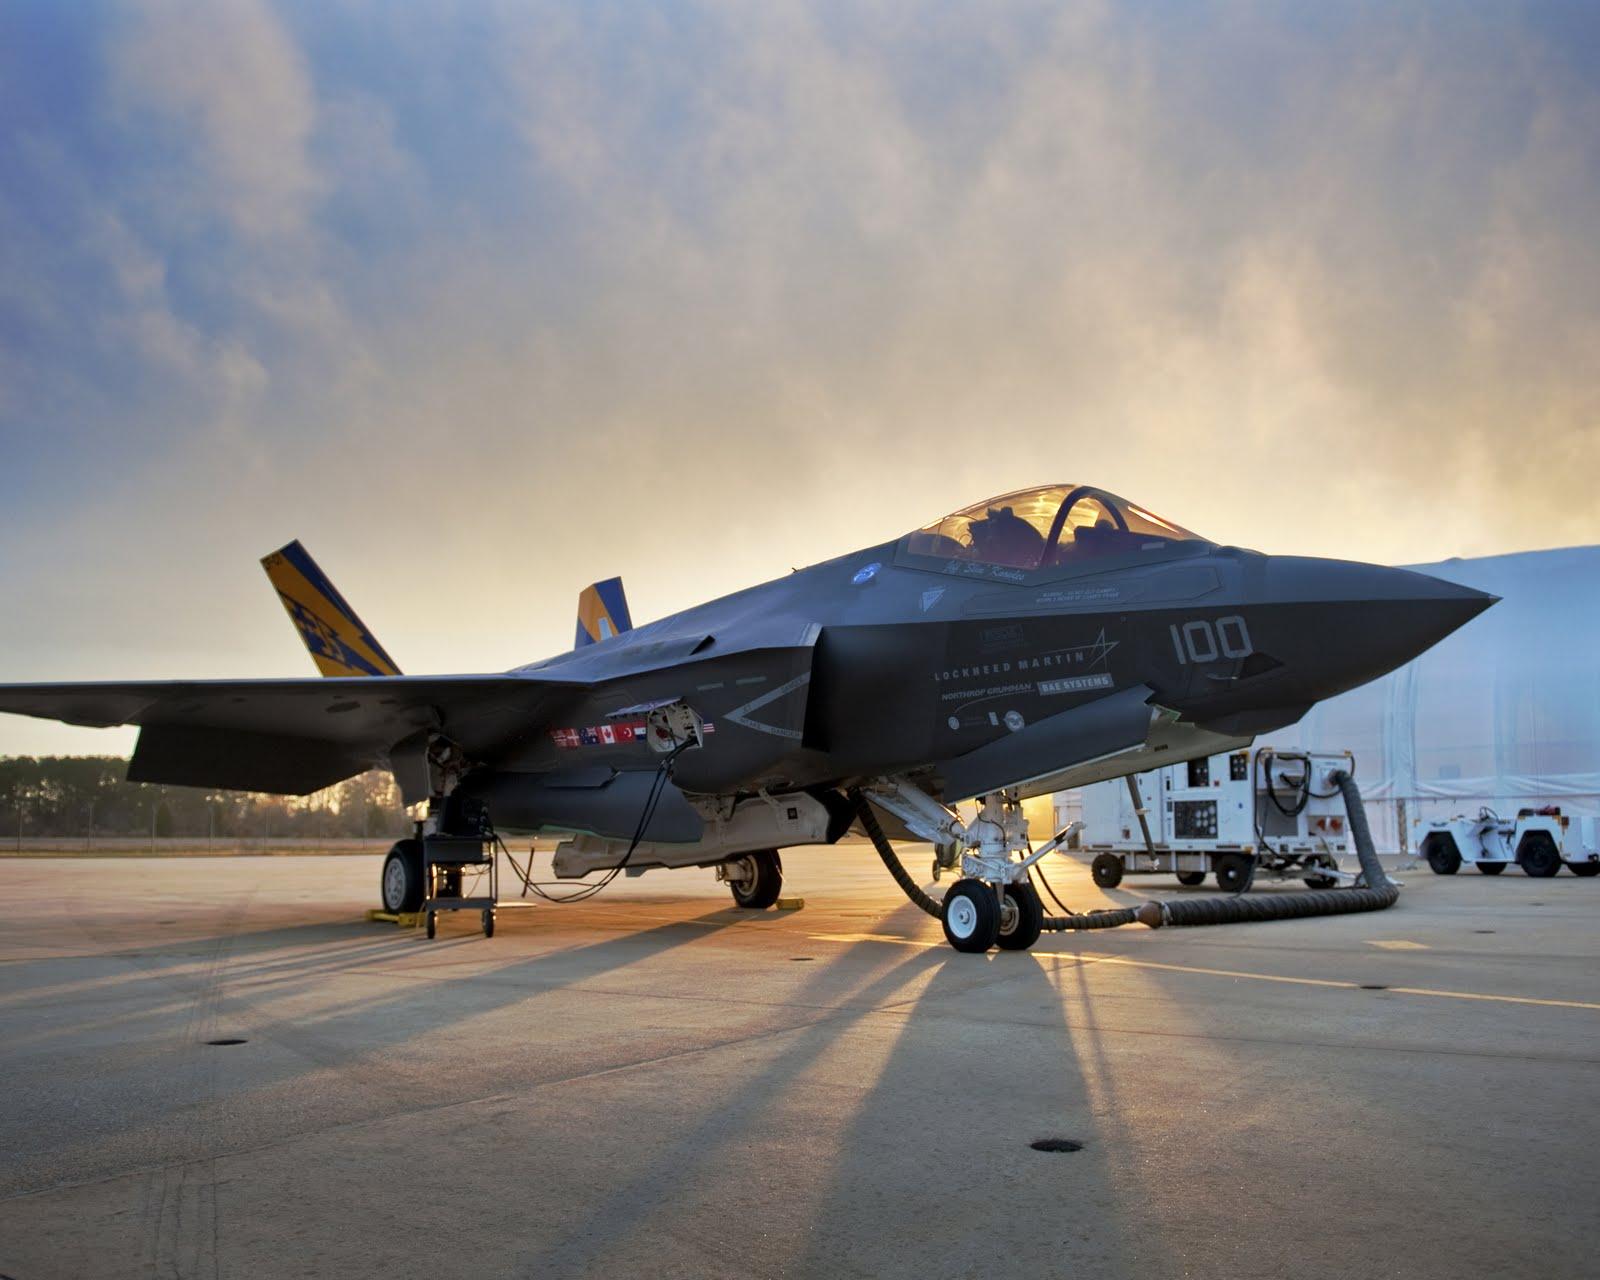 Roubo de dados sobre aeronave F-35 ajuda rivais dos EUA, diz Pentágono